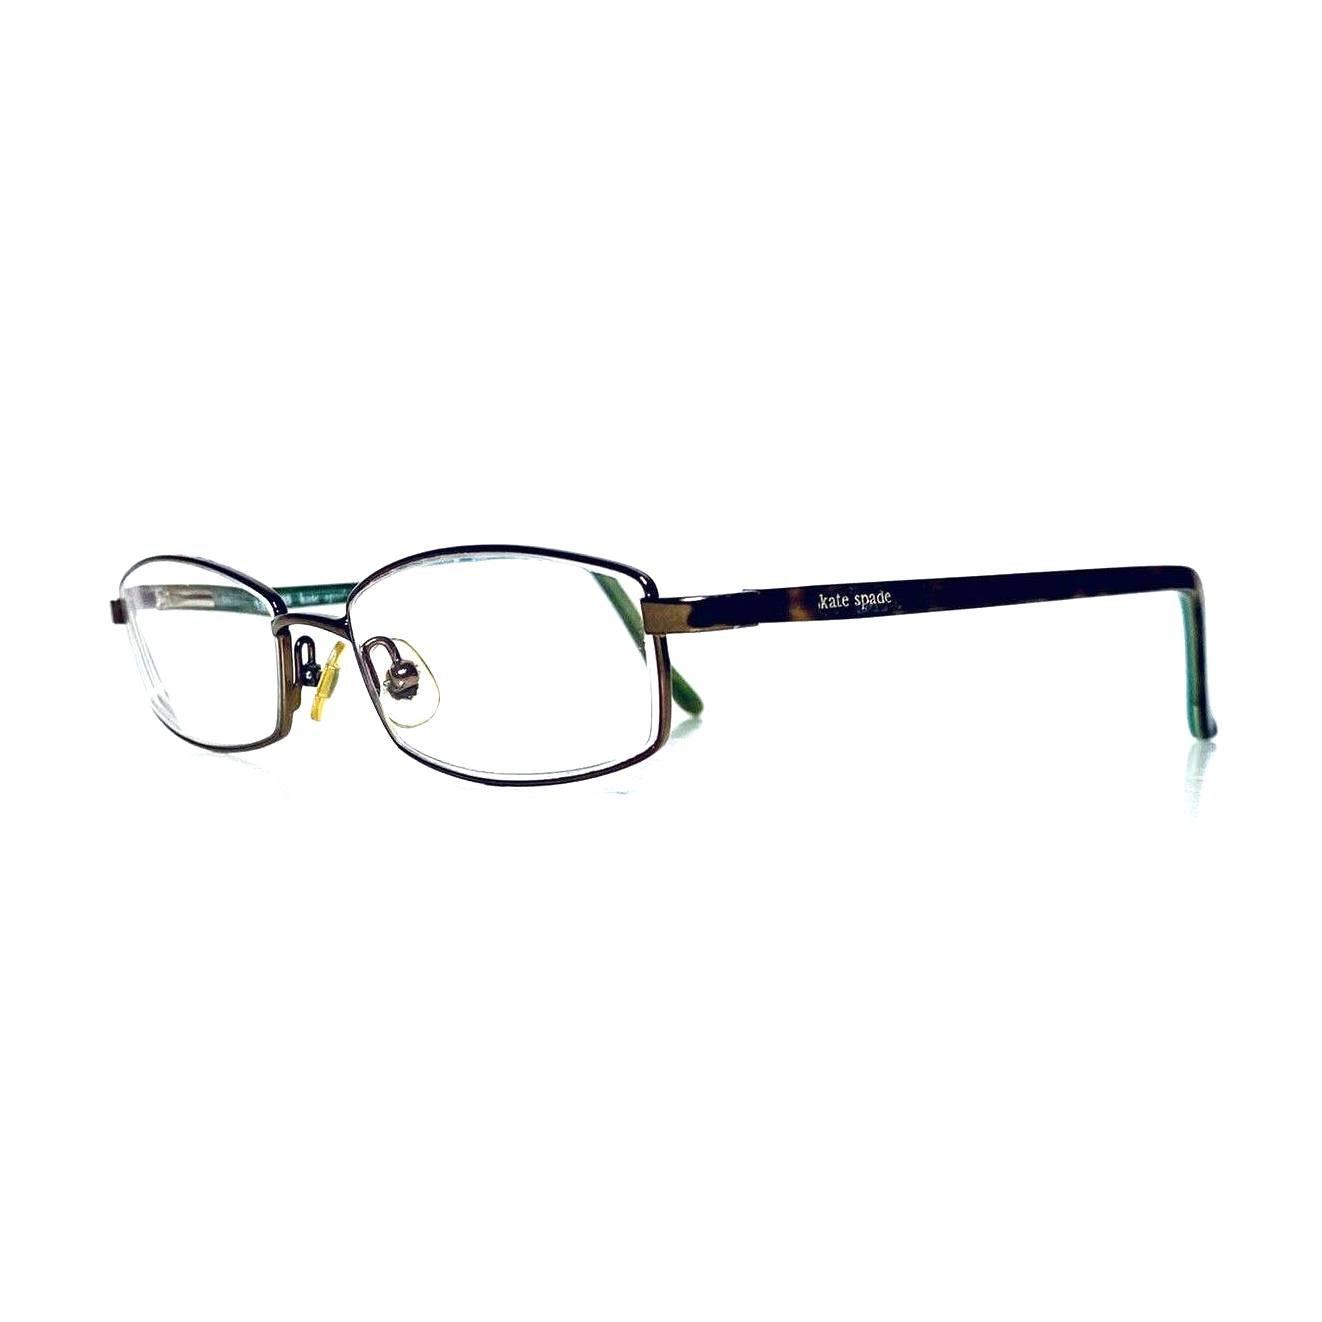 Kate Spade Gold Rectangular Glasses